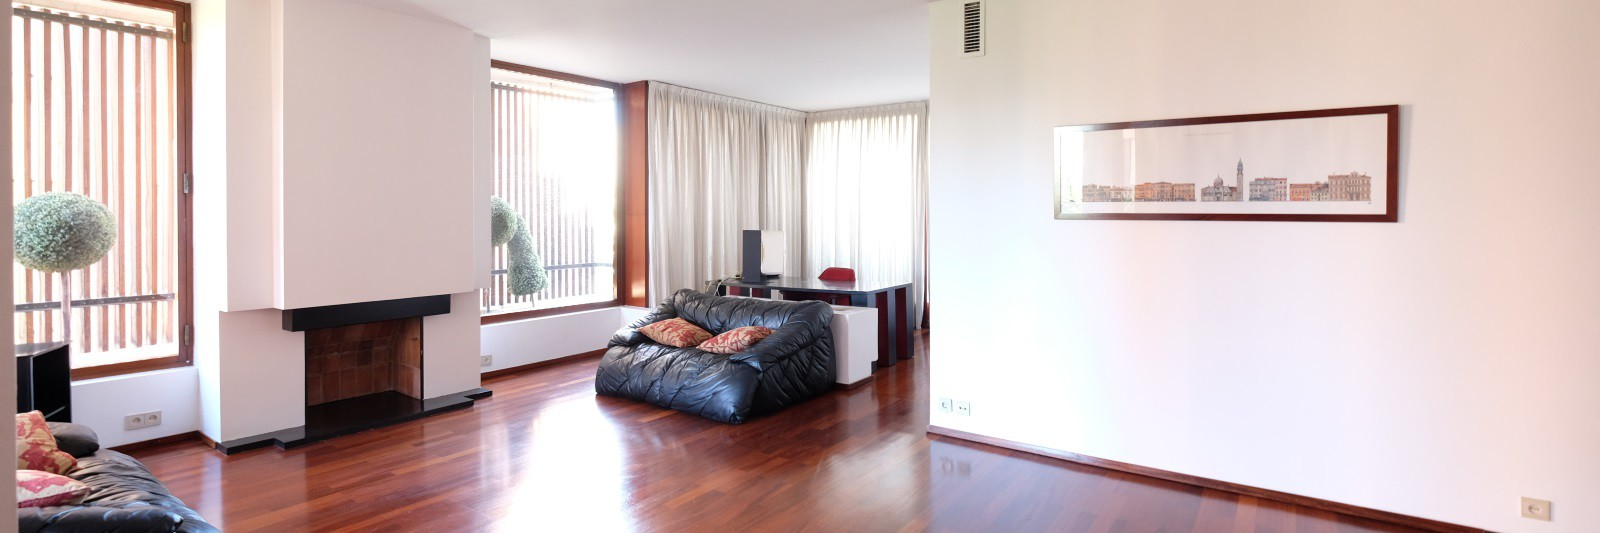 MG Inmobiliaria Barcelona - jtomodolell